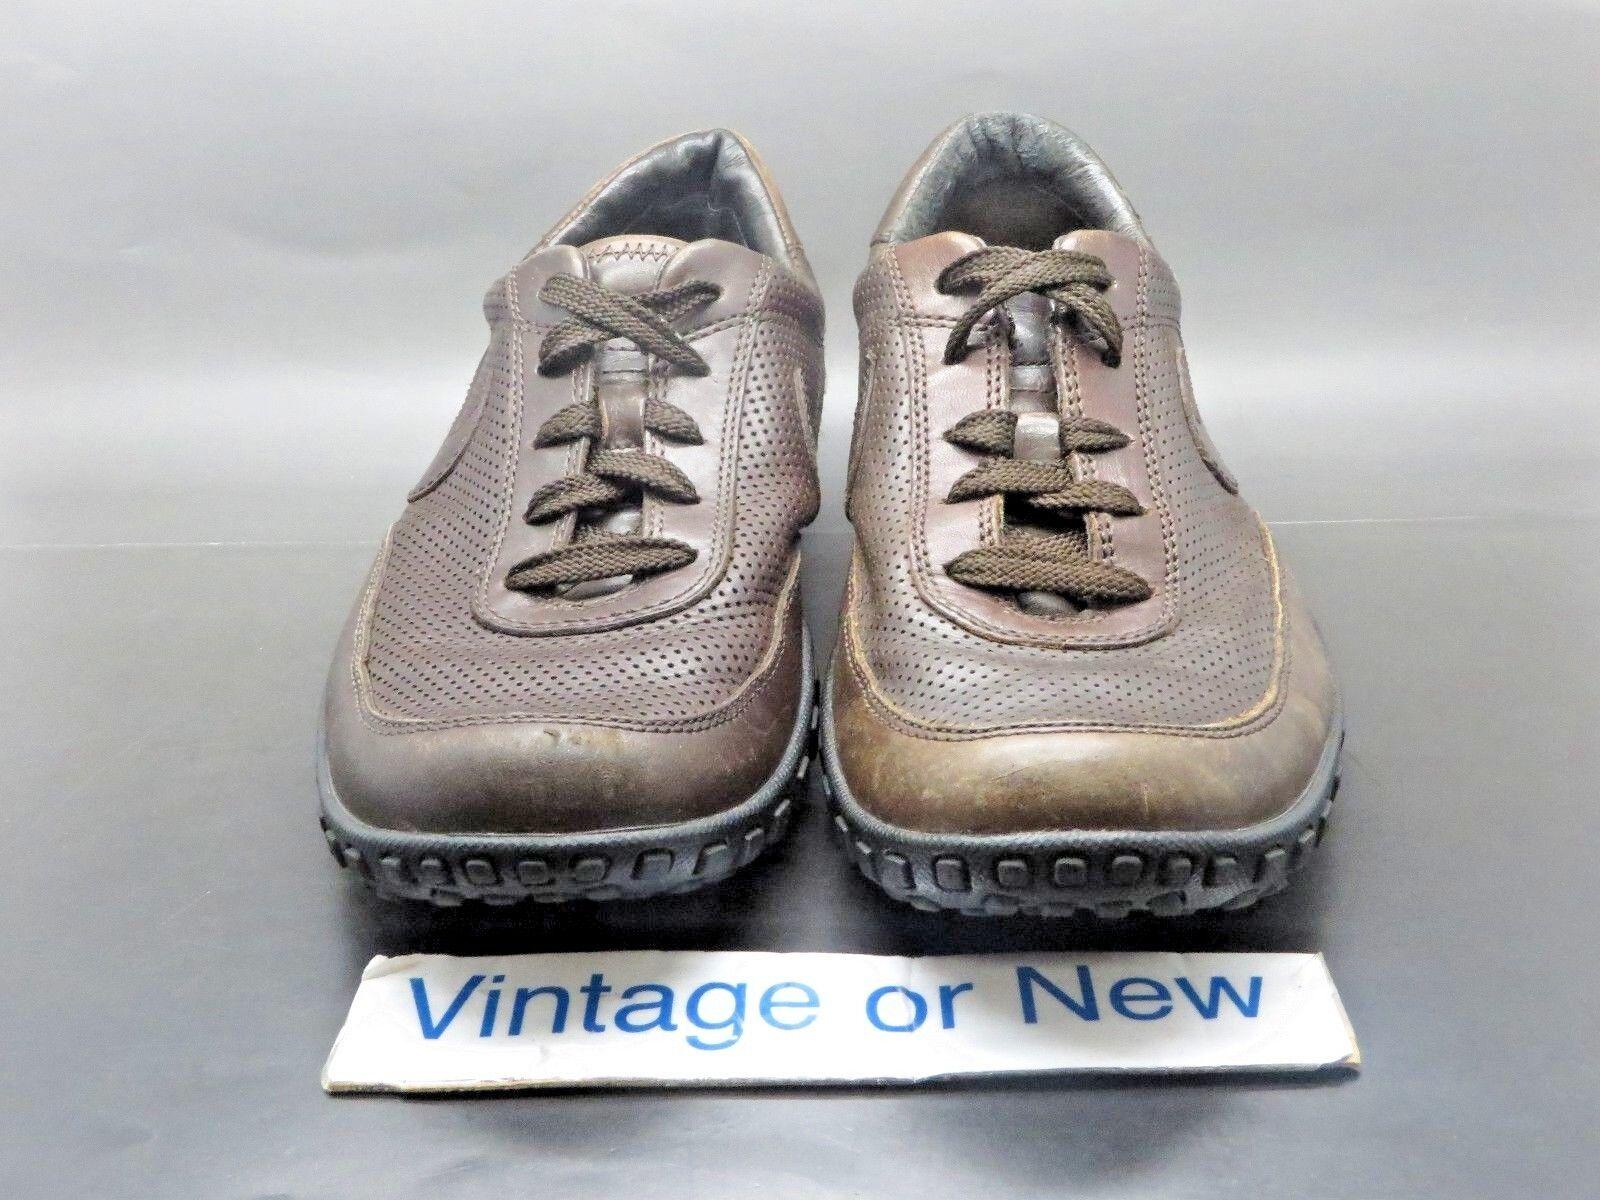 Gli Uomini Sono Nike Waffle Racer Iii Marrone Buio Nero Marrone Iii Cenere,   Da Corsa 2008 Sz 7,5 9468f3